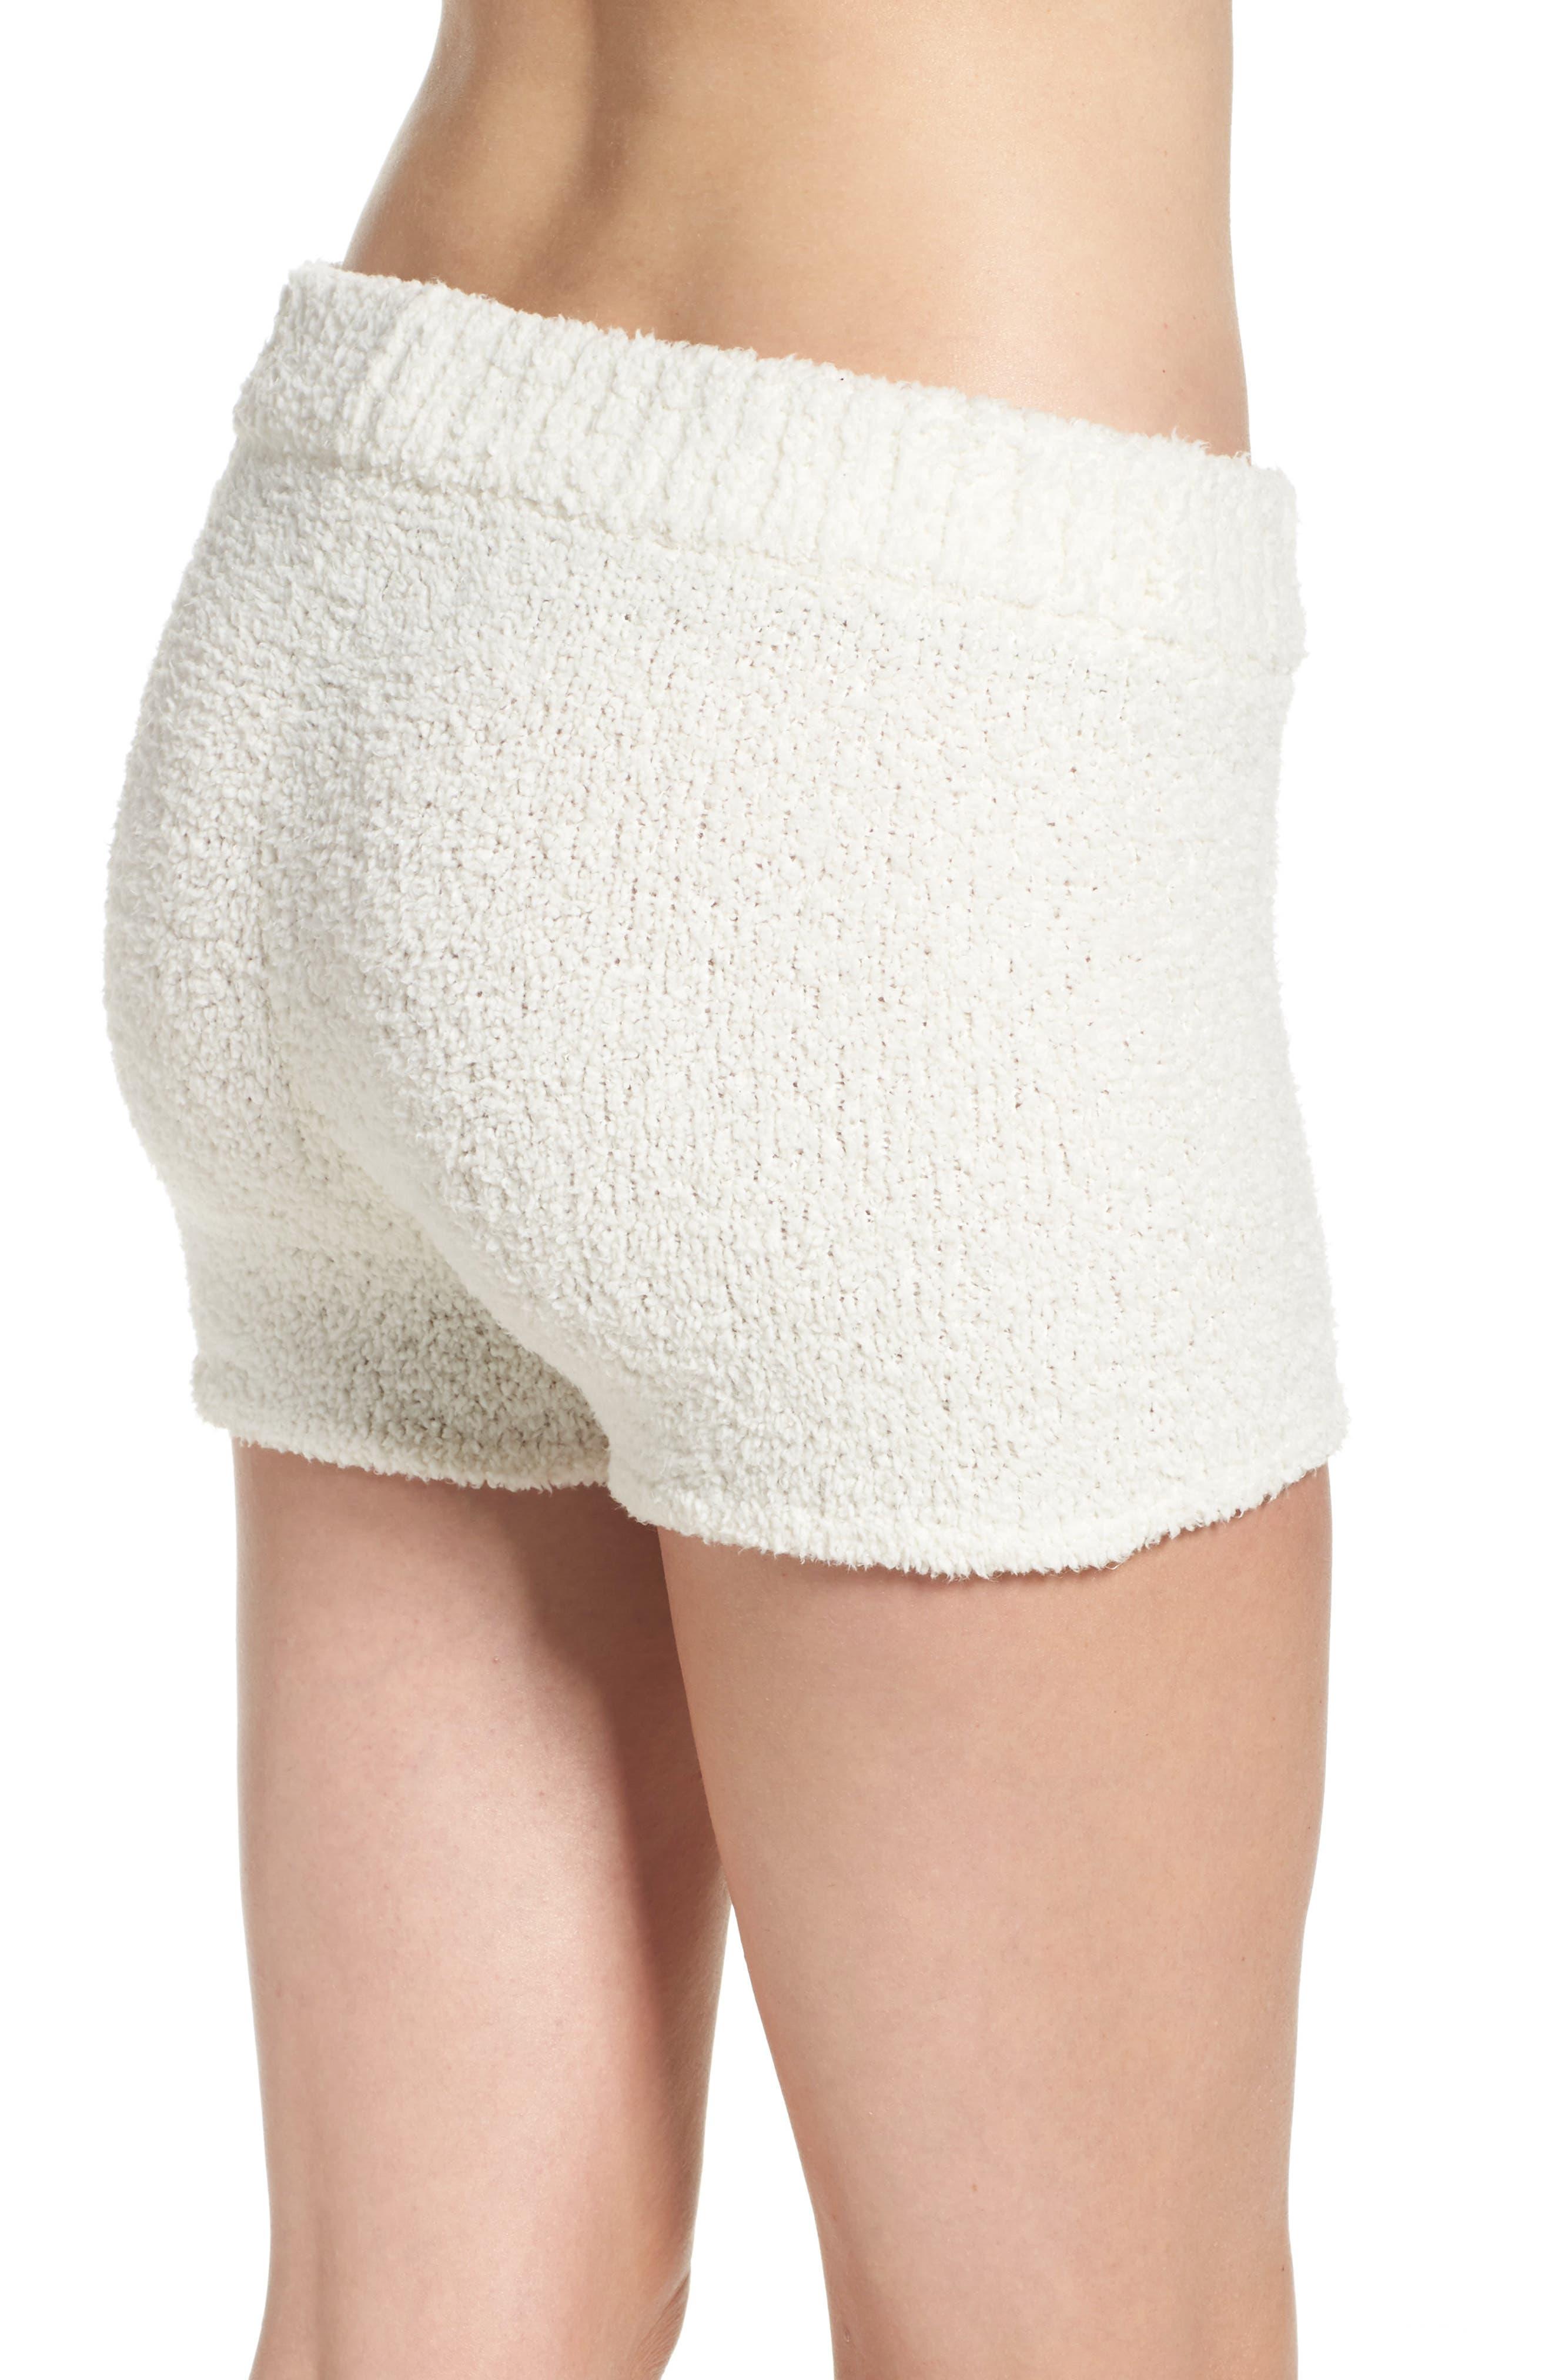 Sweater Knit Pajama Shorts,                             Alternate thumbnail 2, color,                             900